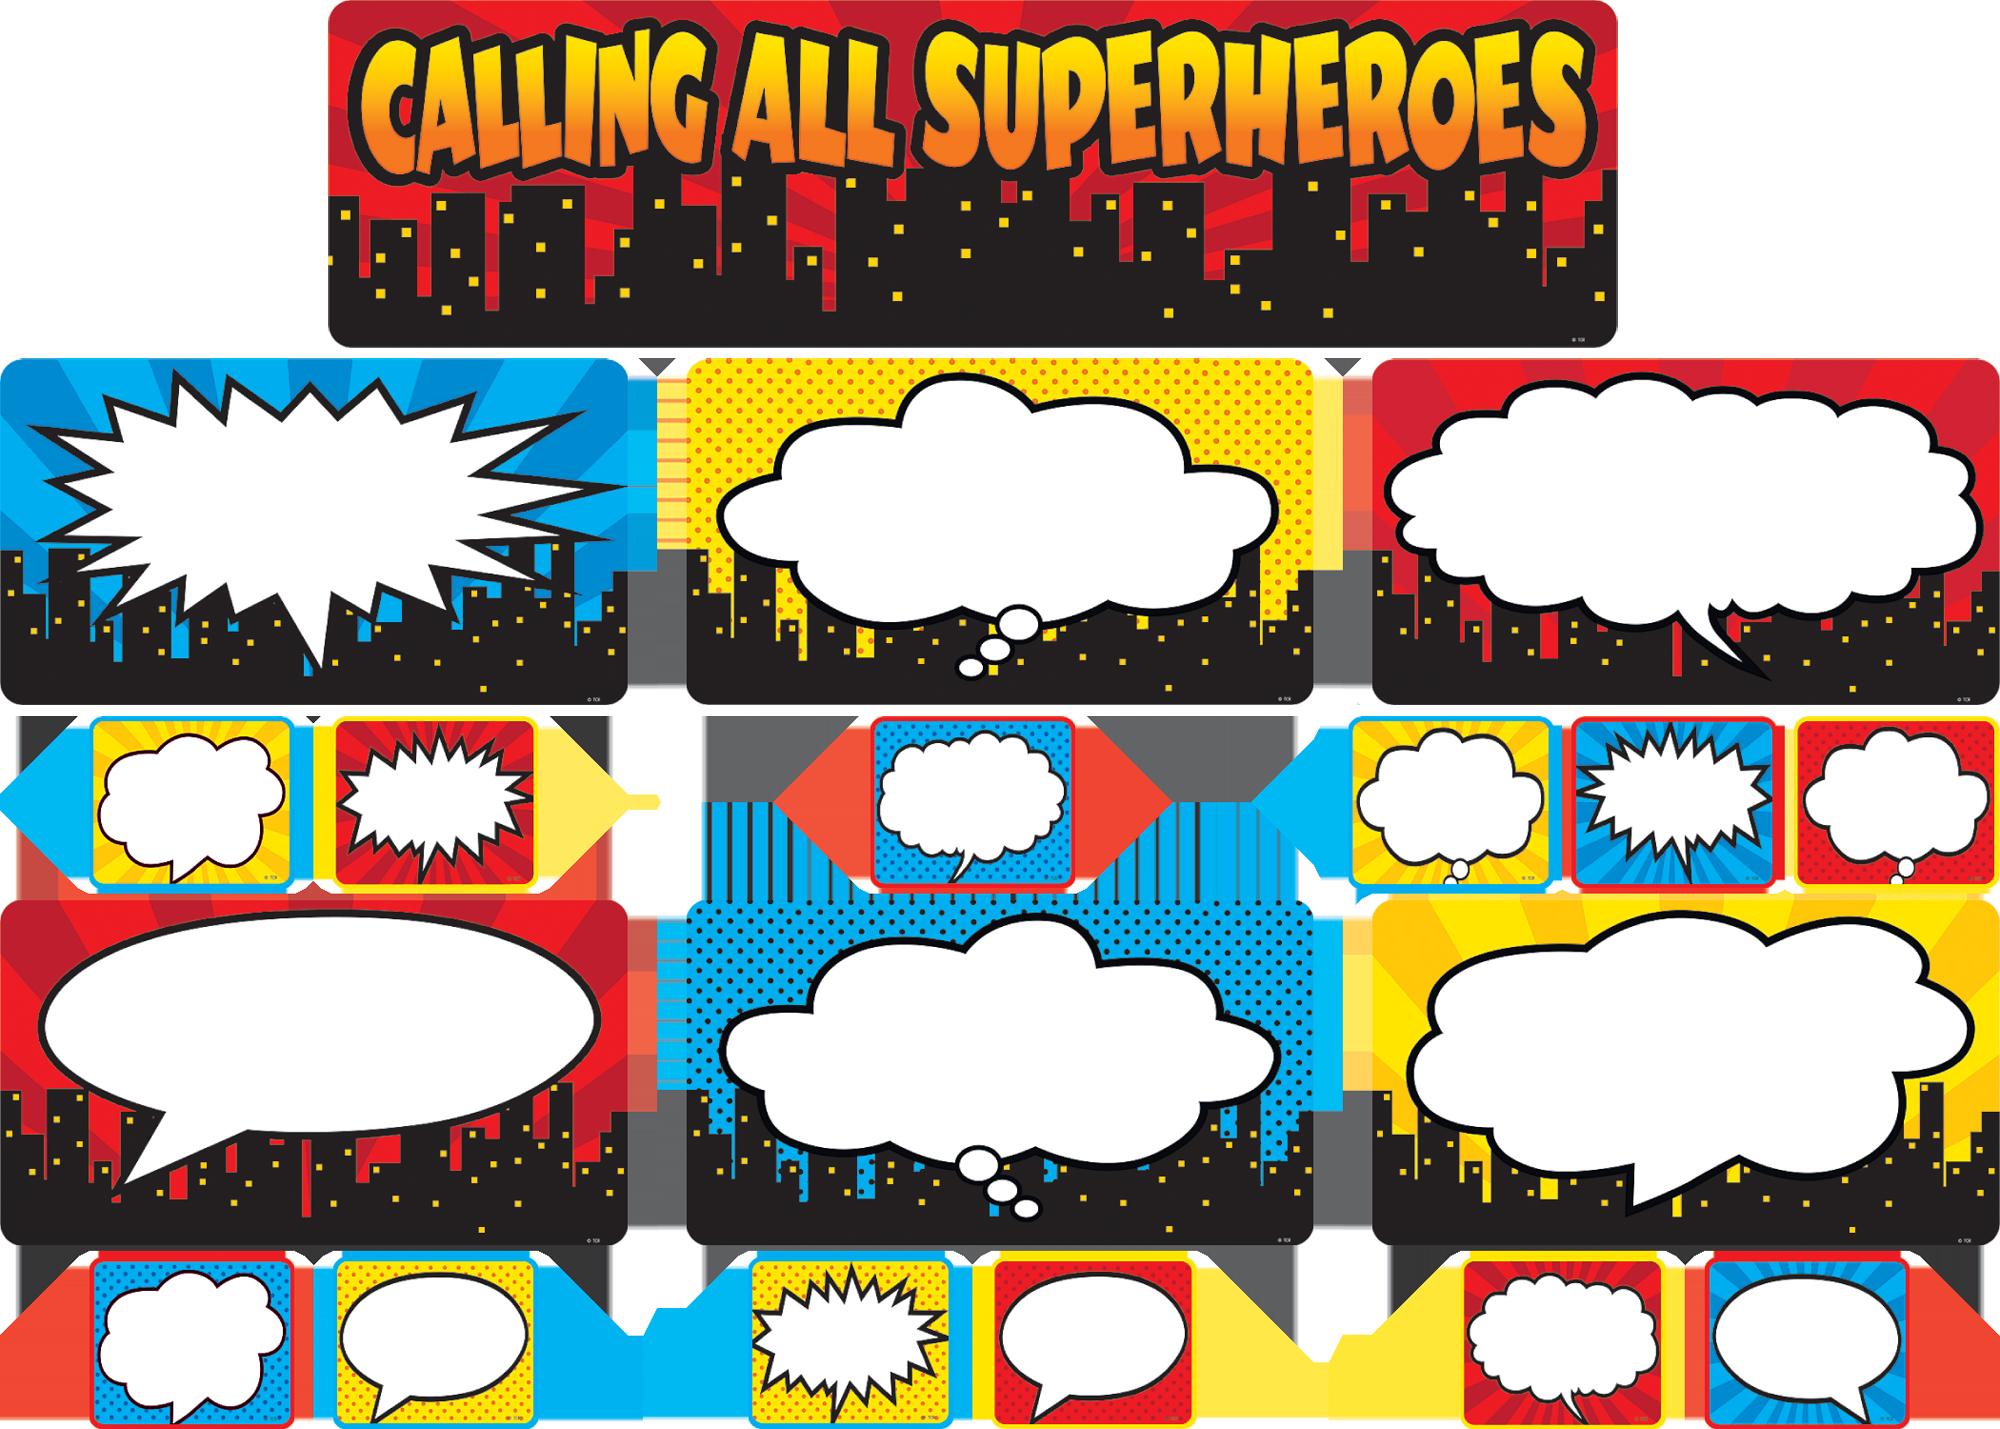 Calling All Superheroes Mini Bulletin Board TCR5825